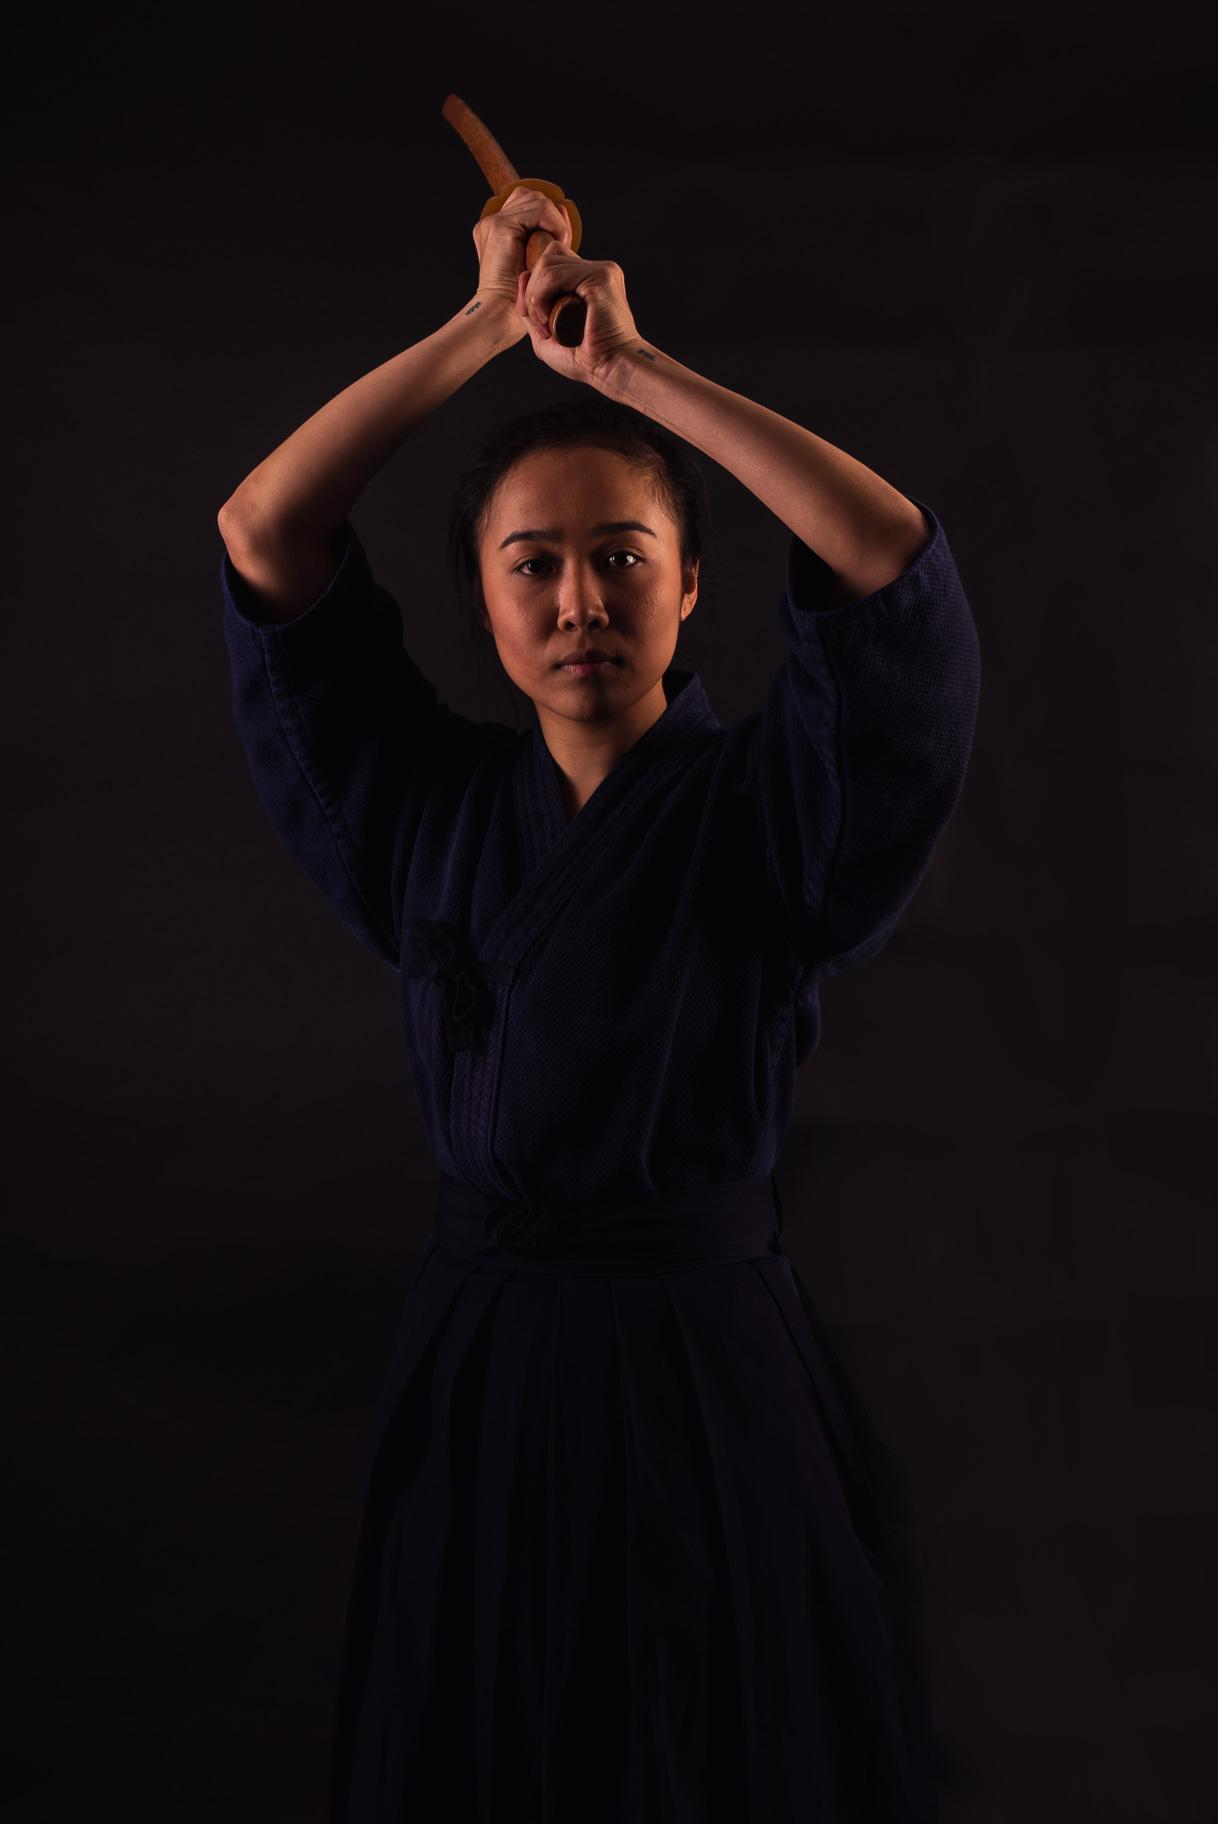 Kendo athlete Karen Toyoshima has been harnessing her kendoka skills for the past three years